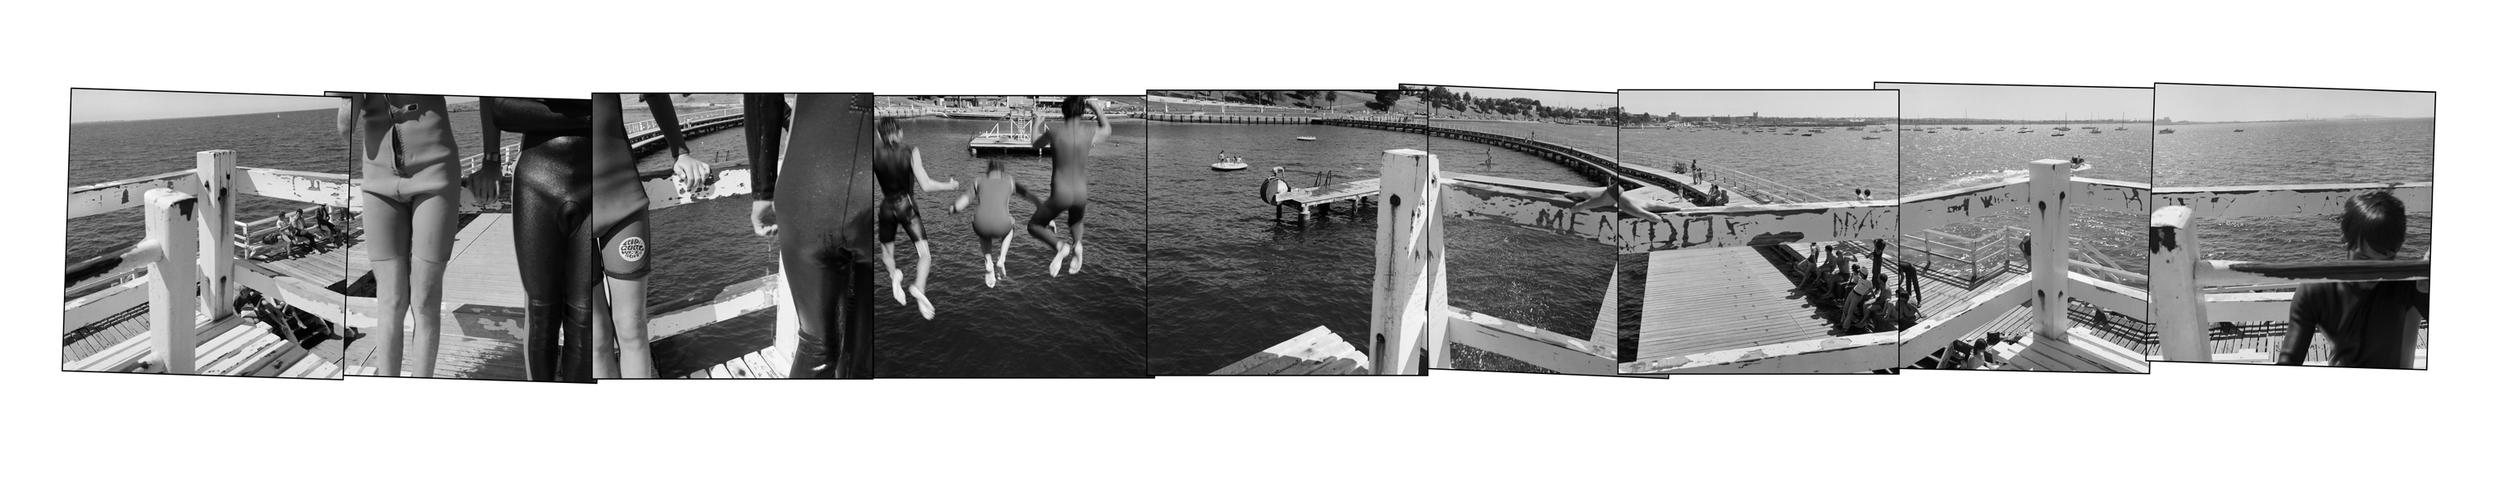 John O'Neil  Eastern Beach (Jumpers)  Photograph 61x300cms (unframed $2,750)